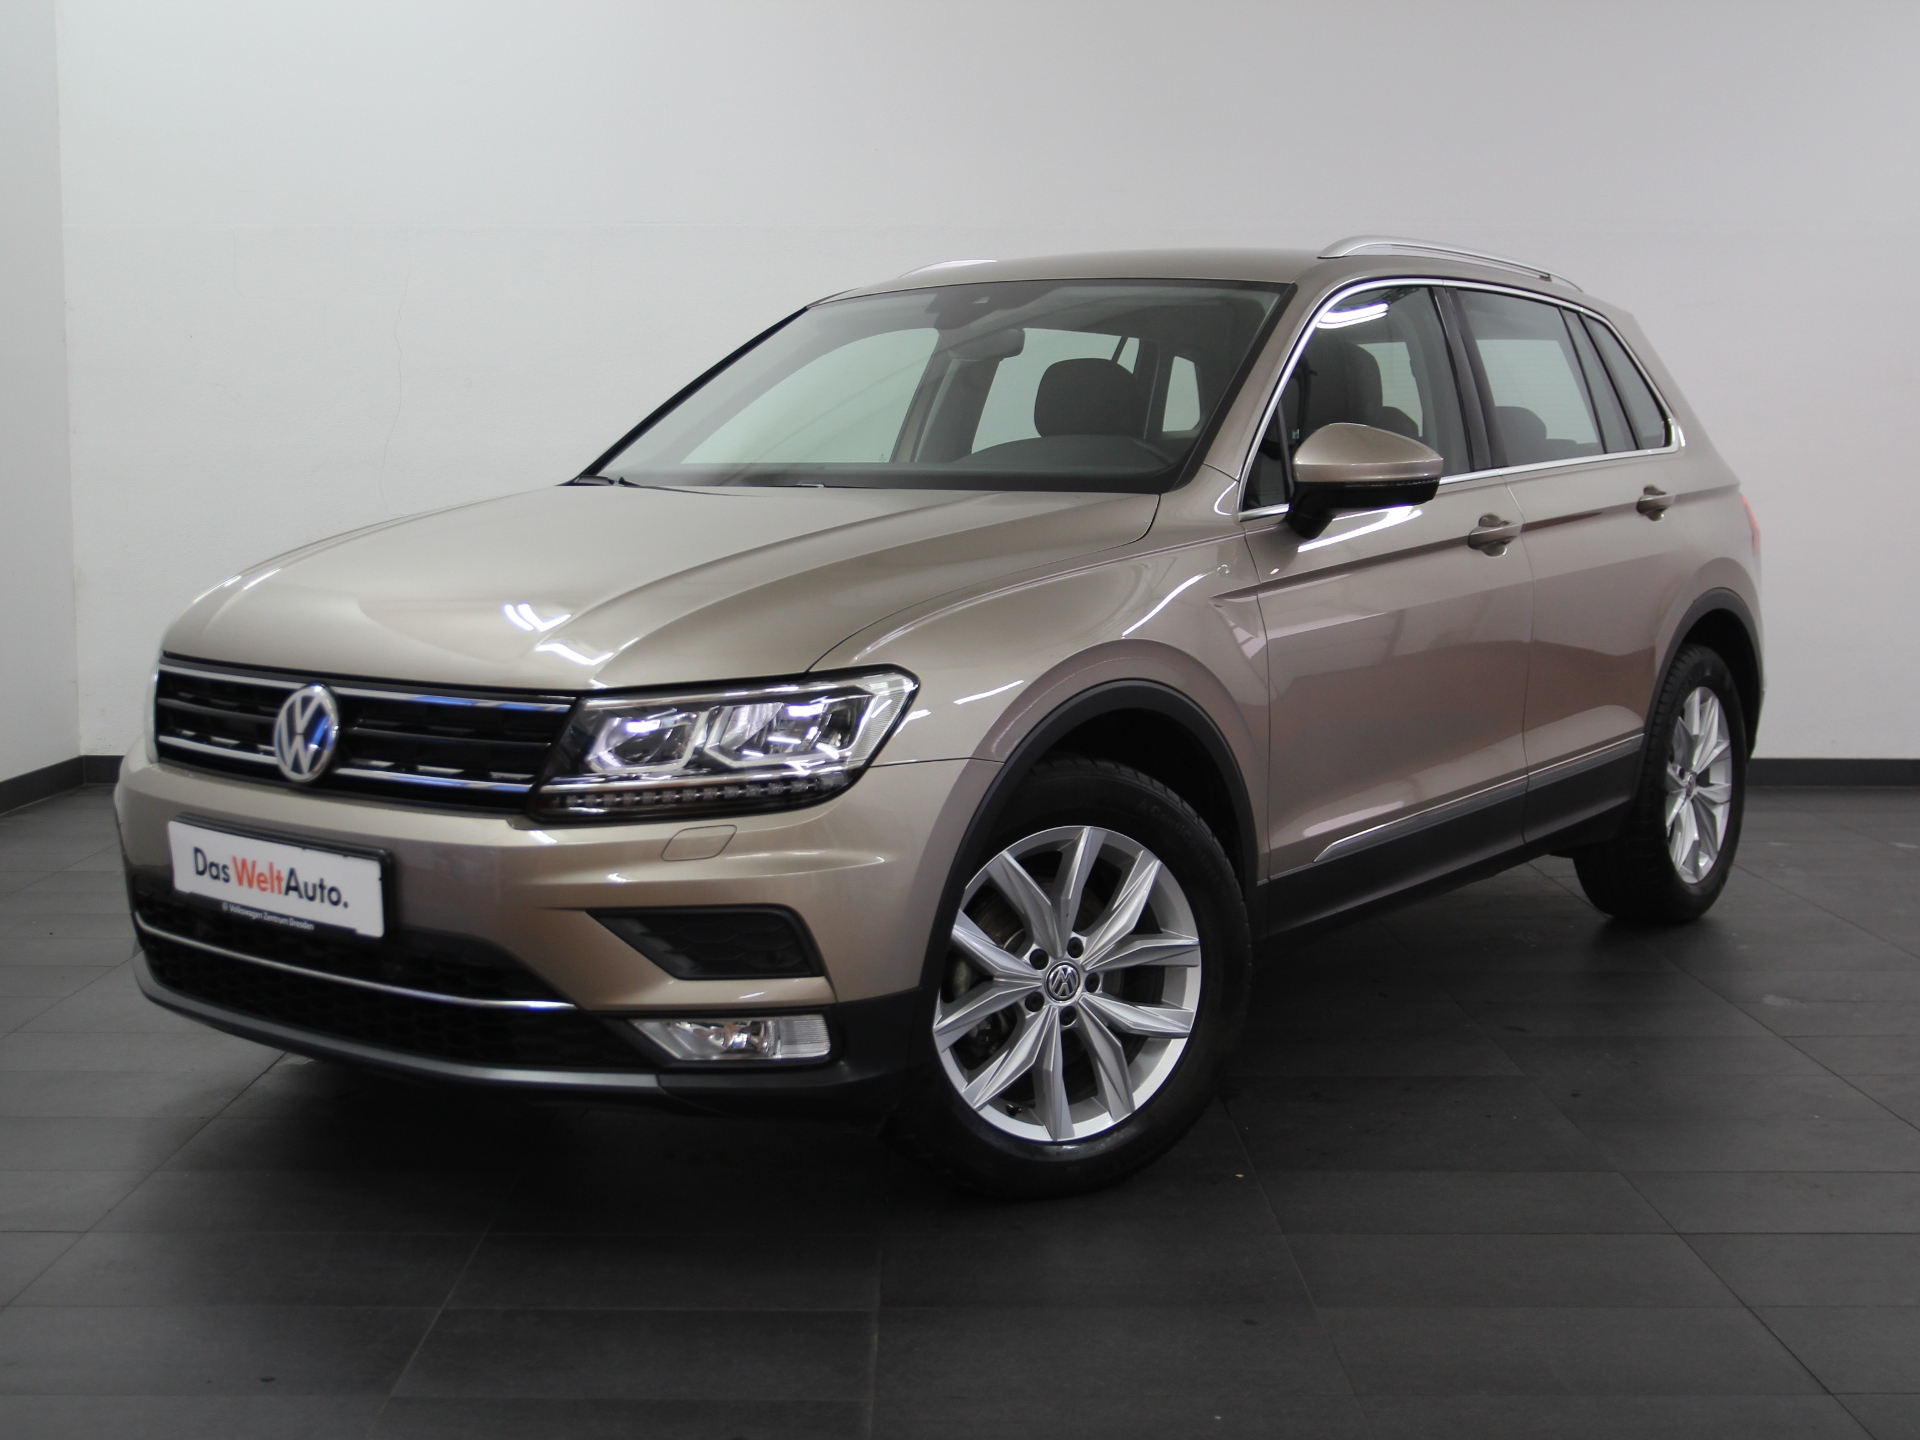 Volkswagen Tiguan Highline 2.0 TDI LED NAV ACC AB 2,99%, Jahr 2016, Diesel